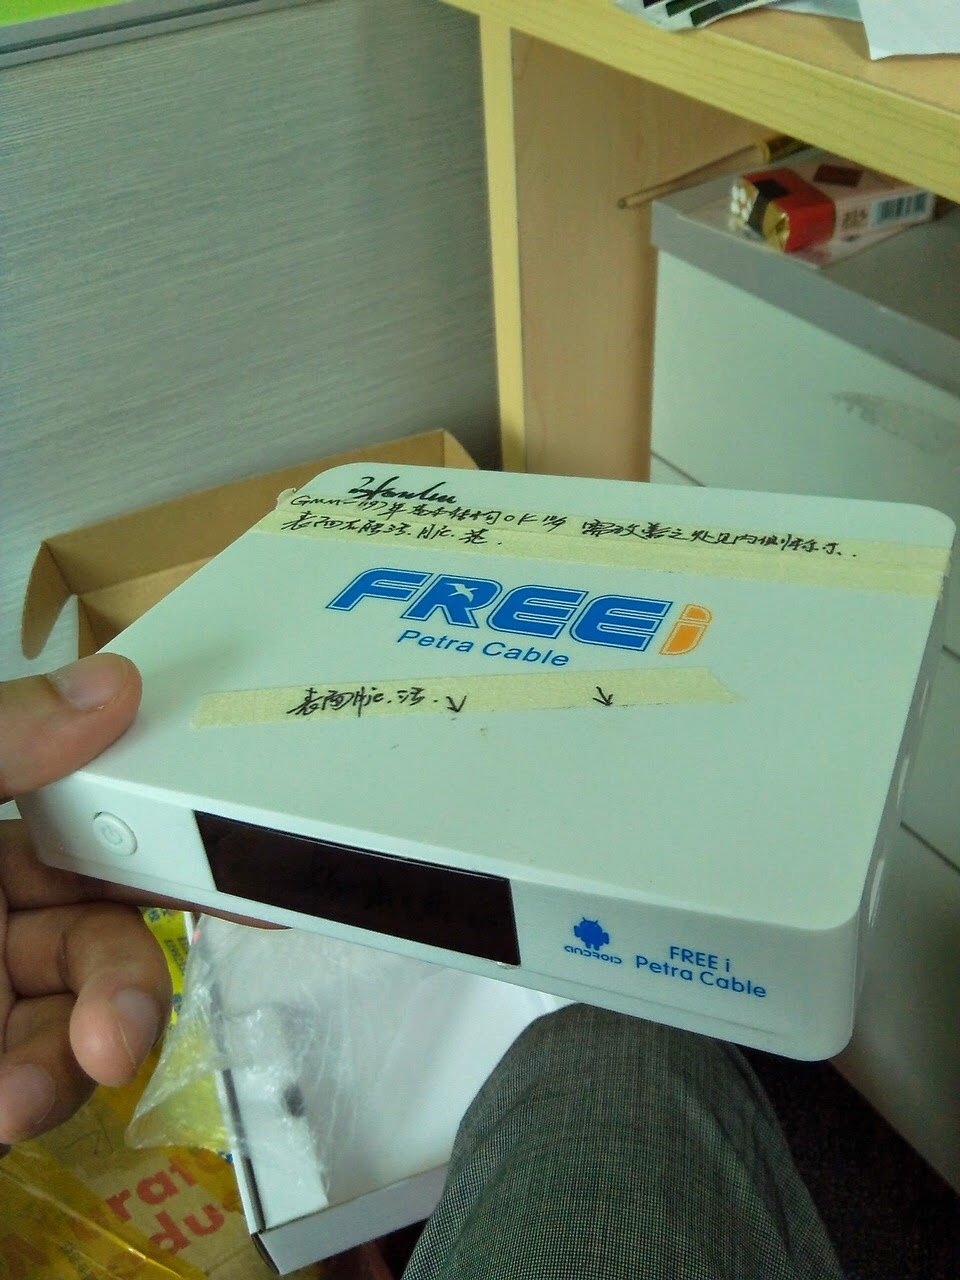 freei - FREEI PETRA HD CABLE LANÇAMENTO PRIMEIRAS IMAGENS -  IMG-20141008-WA0043